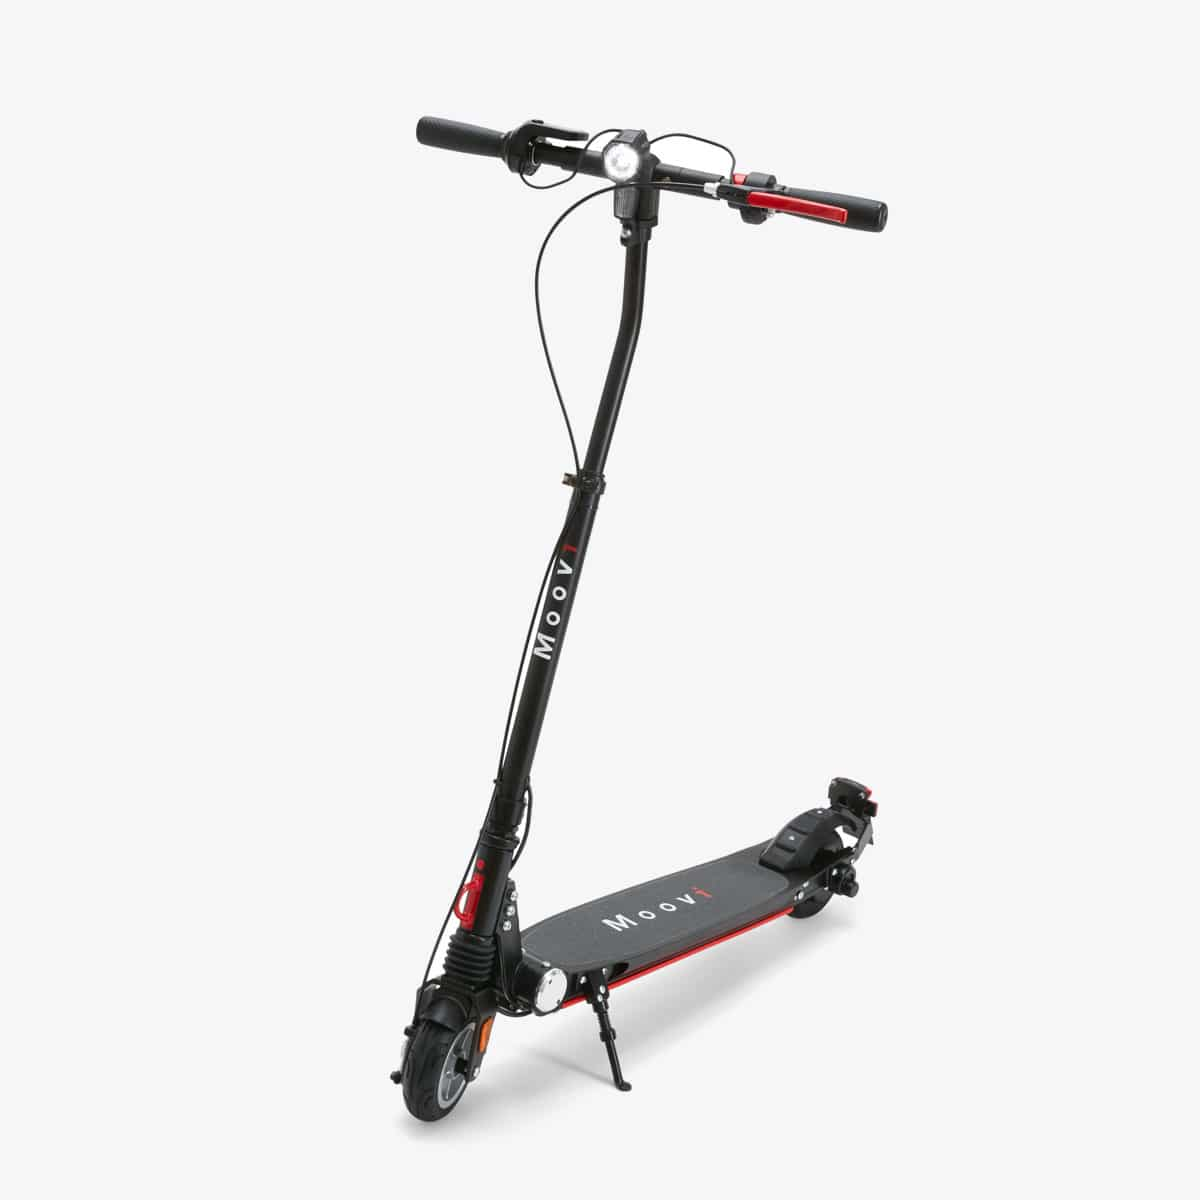 moovi-escooter-stvo-strassenzulassung